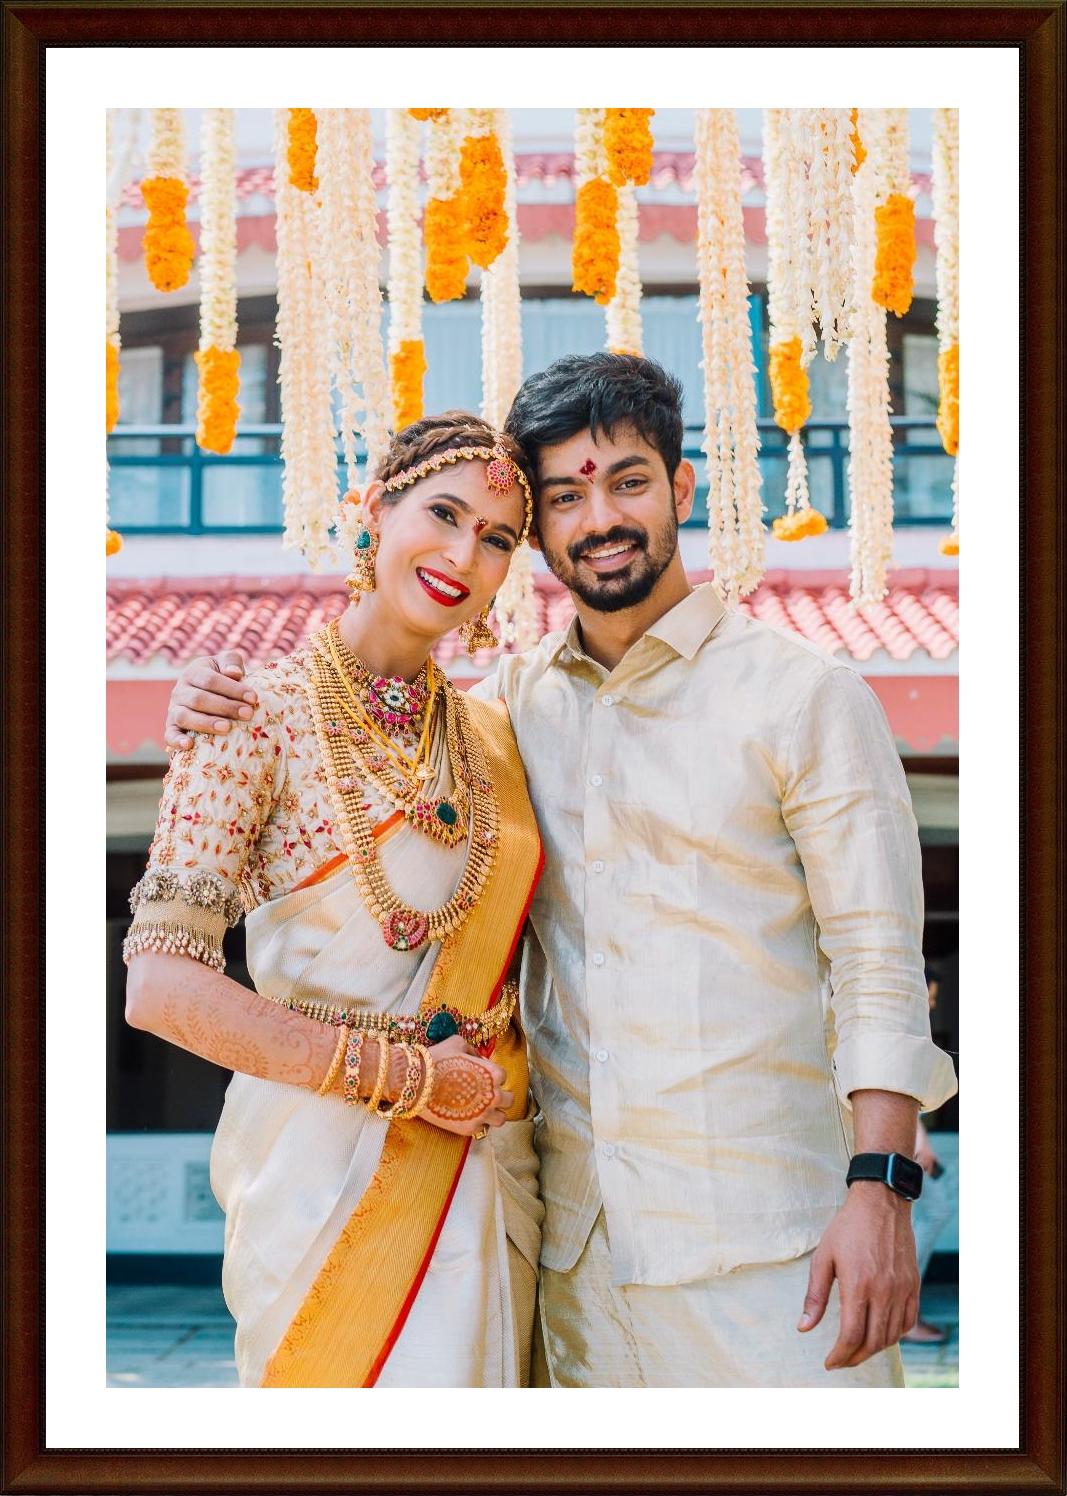 mahat-raghavendra-prachi-mishra-marriage-4